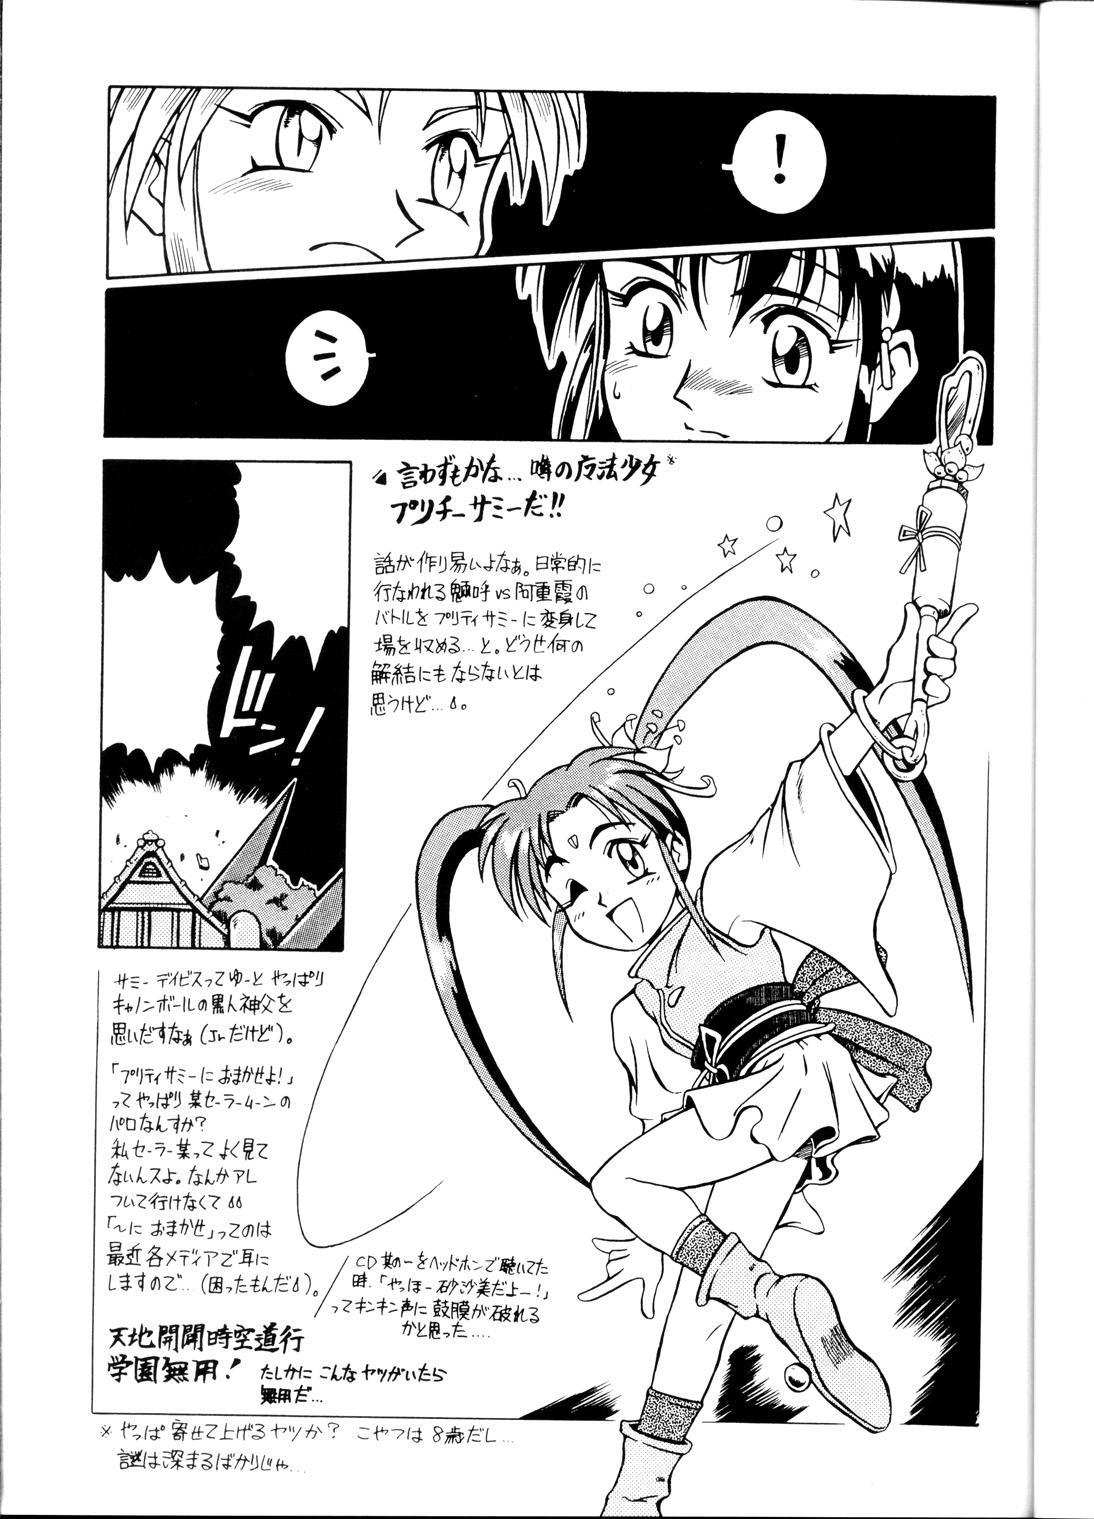 [B.B.C] Tenchi Muyou! Ryou-ou-ki Kaiteiben (Tenchi Muyou!) 11